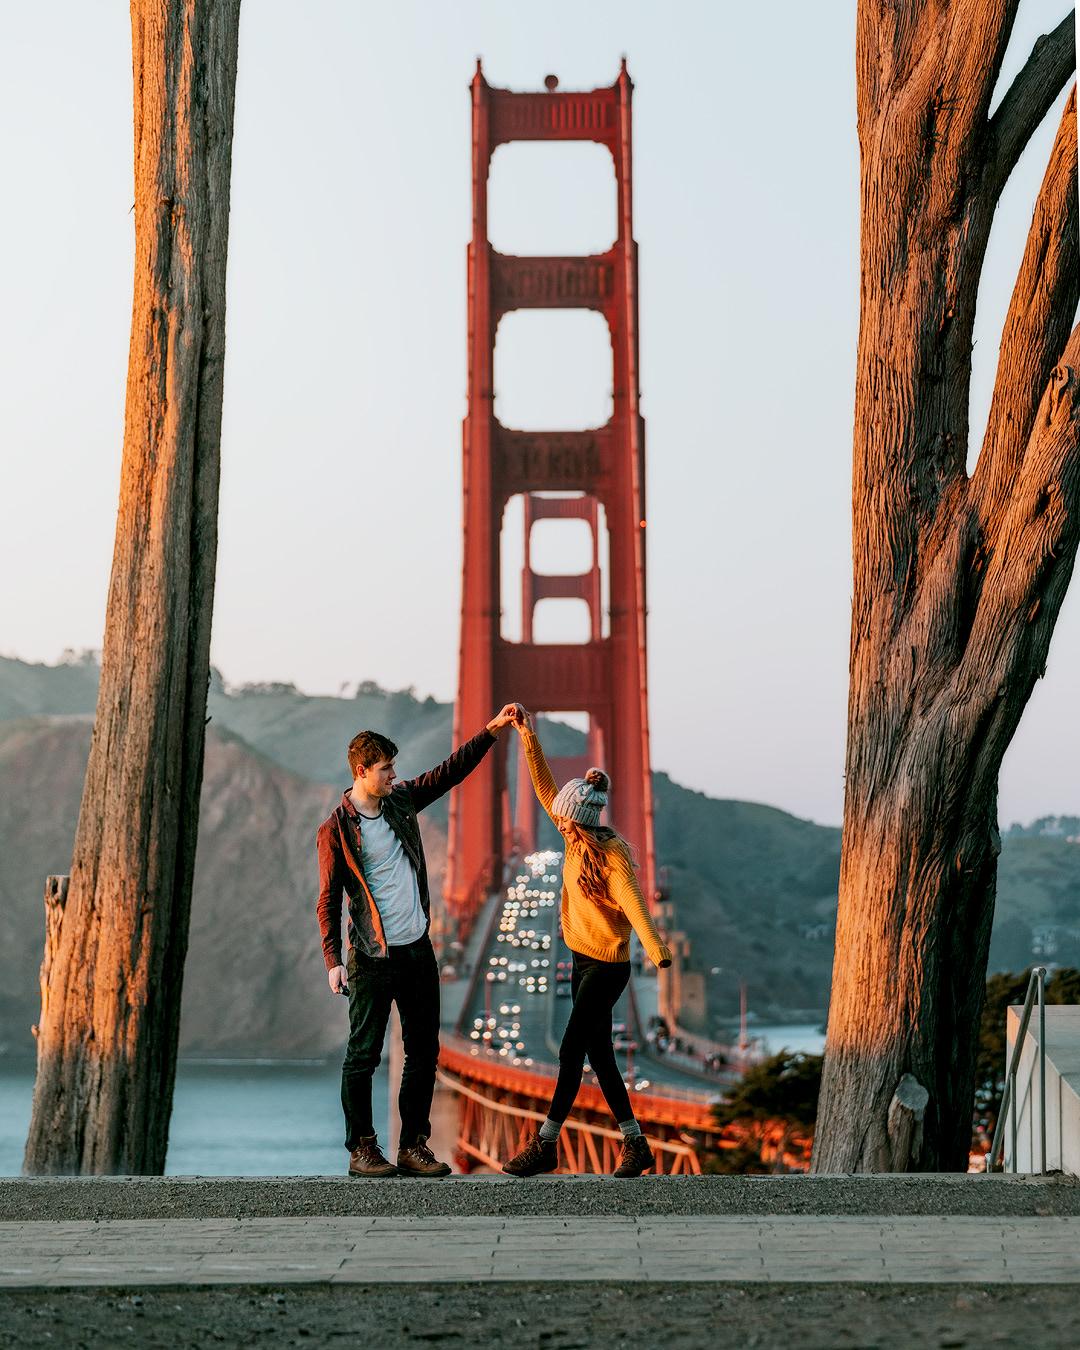 How-to-Spend-24-Hours-in-San-Francisco---Golden-Gate-Bridge-Renee-Roaming